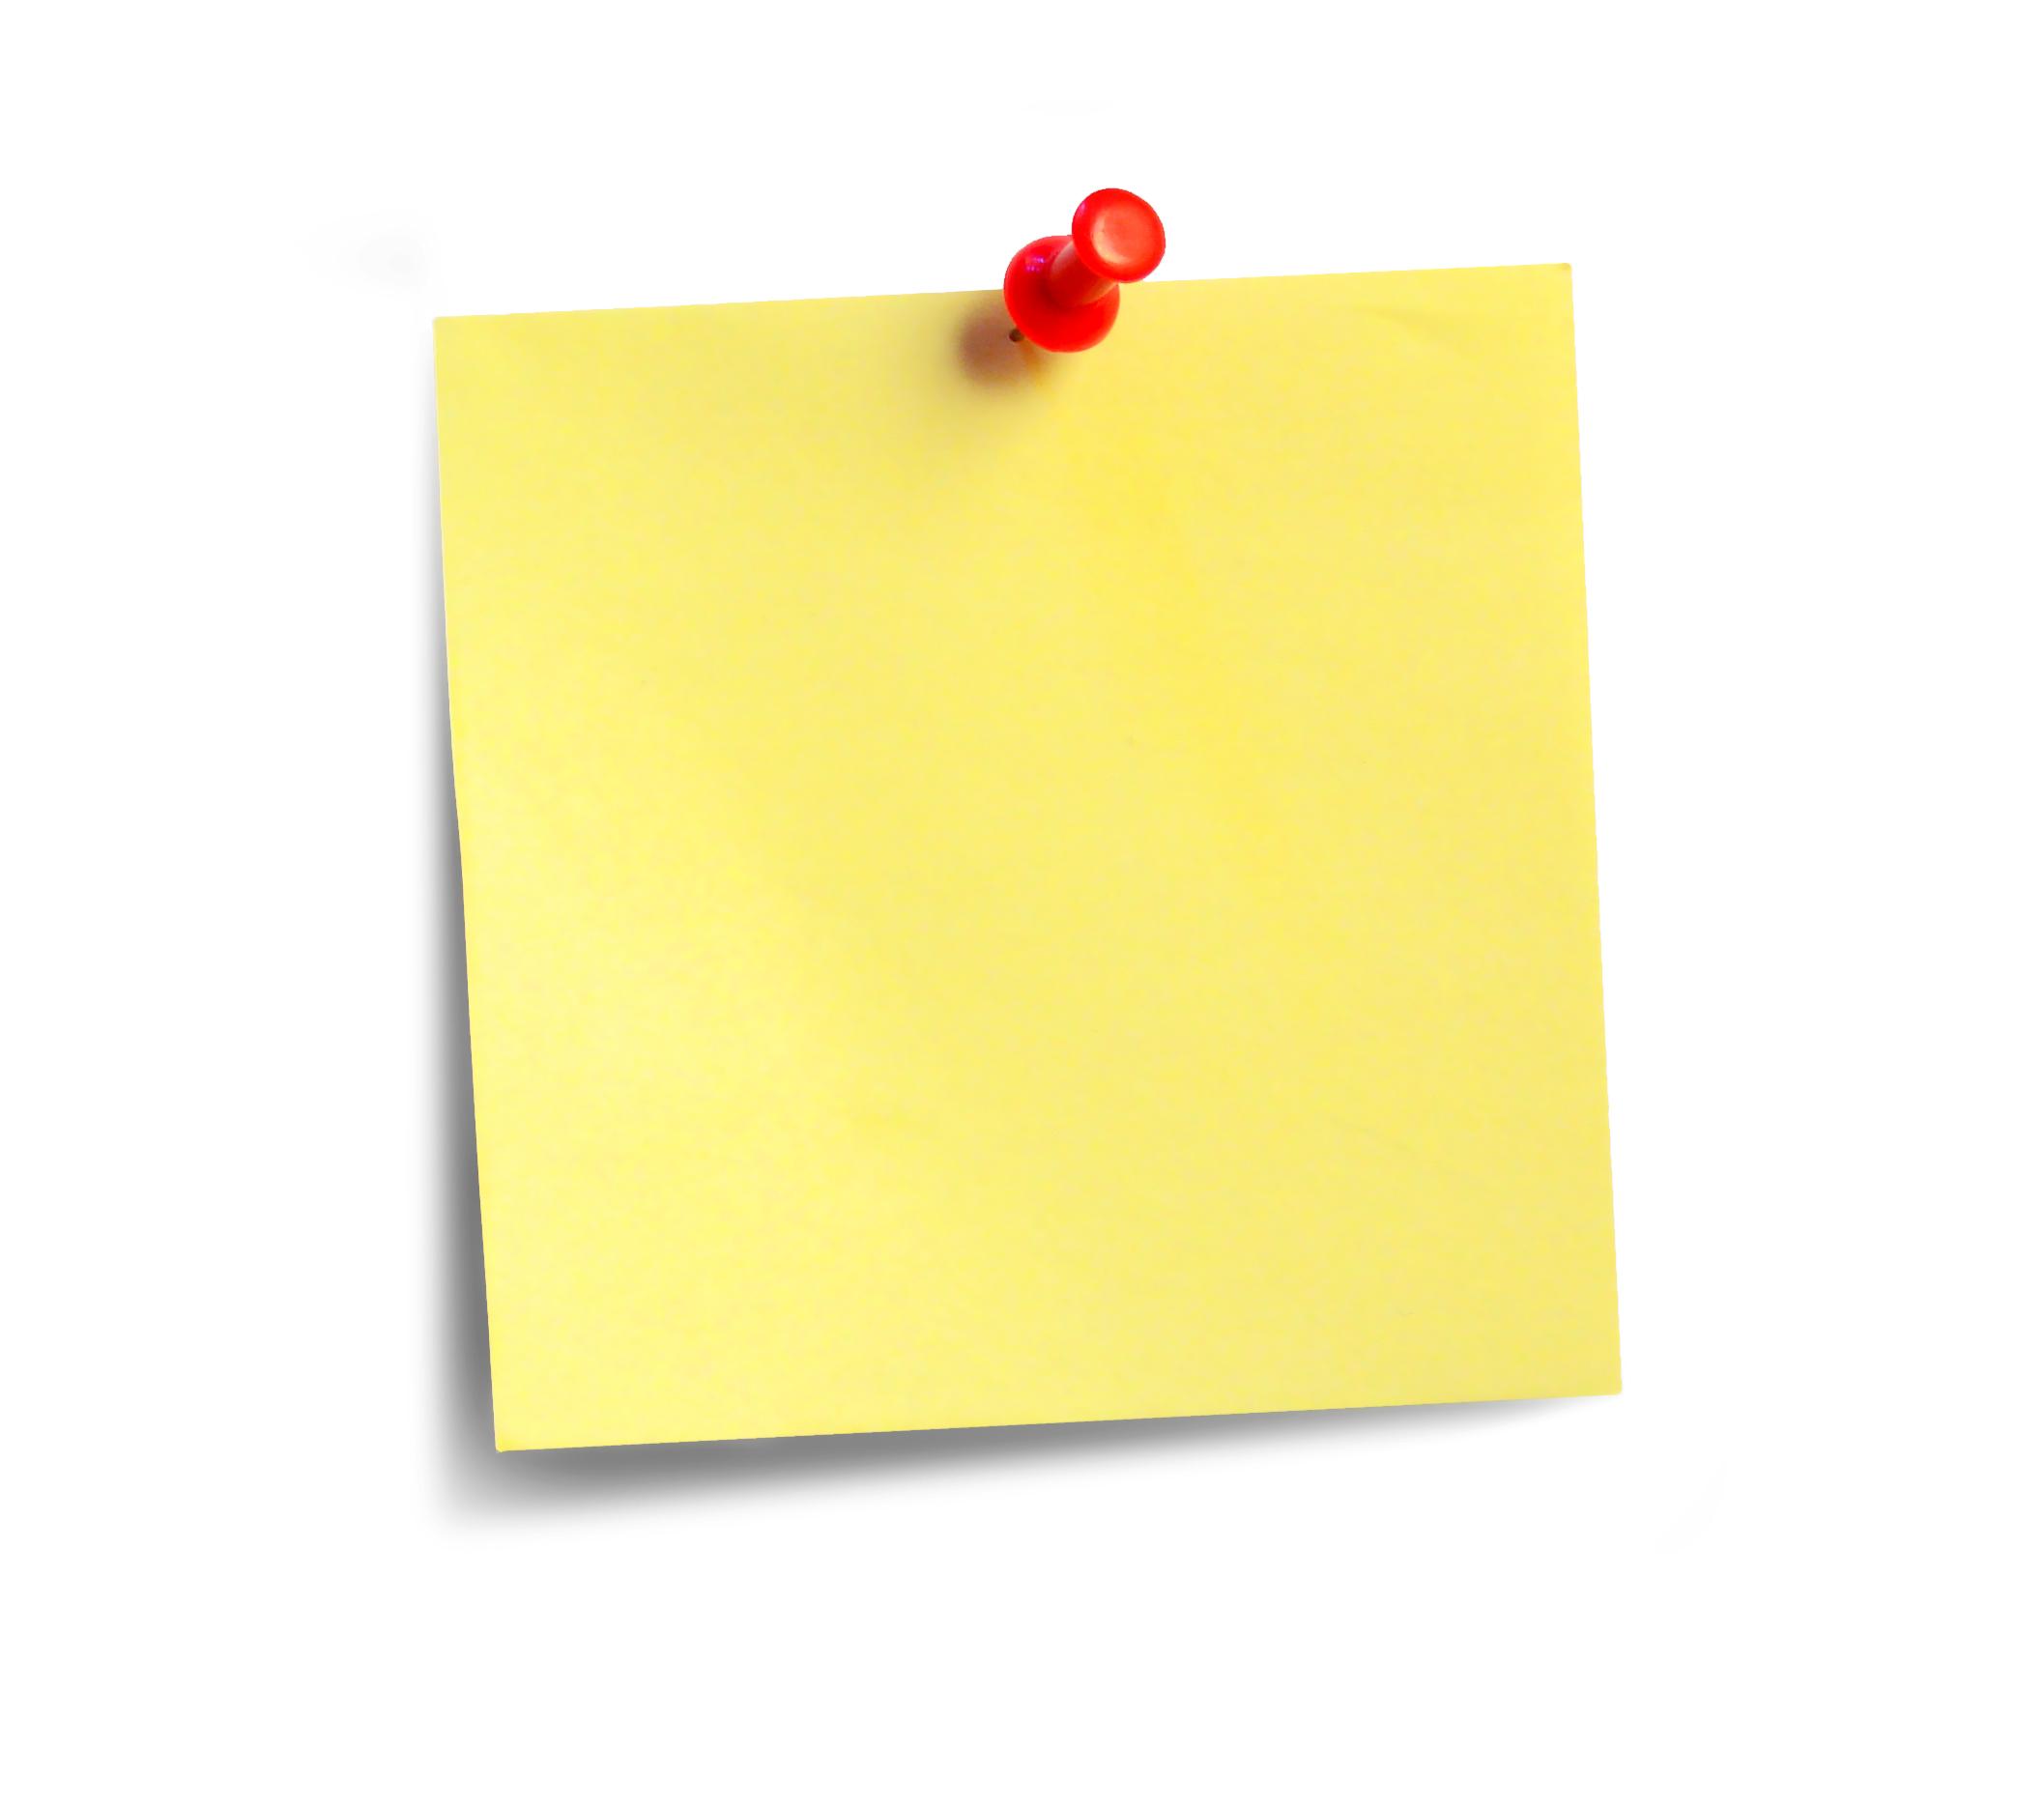 Post-it clipart Panda Clipart Notes post%20it%20notes%20clipart Clipart